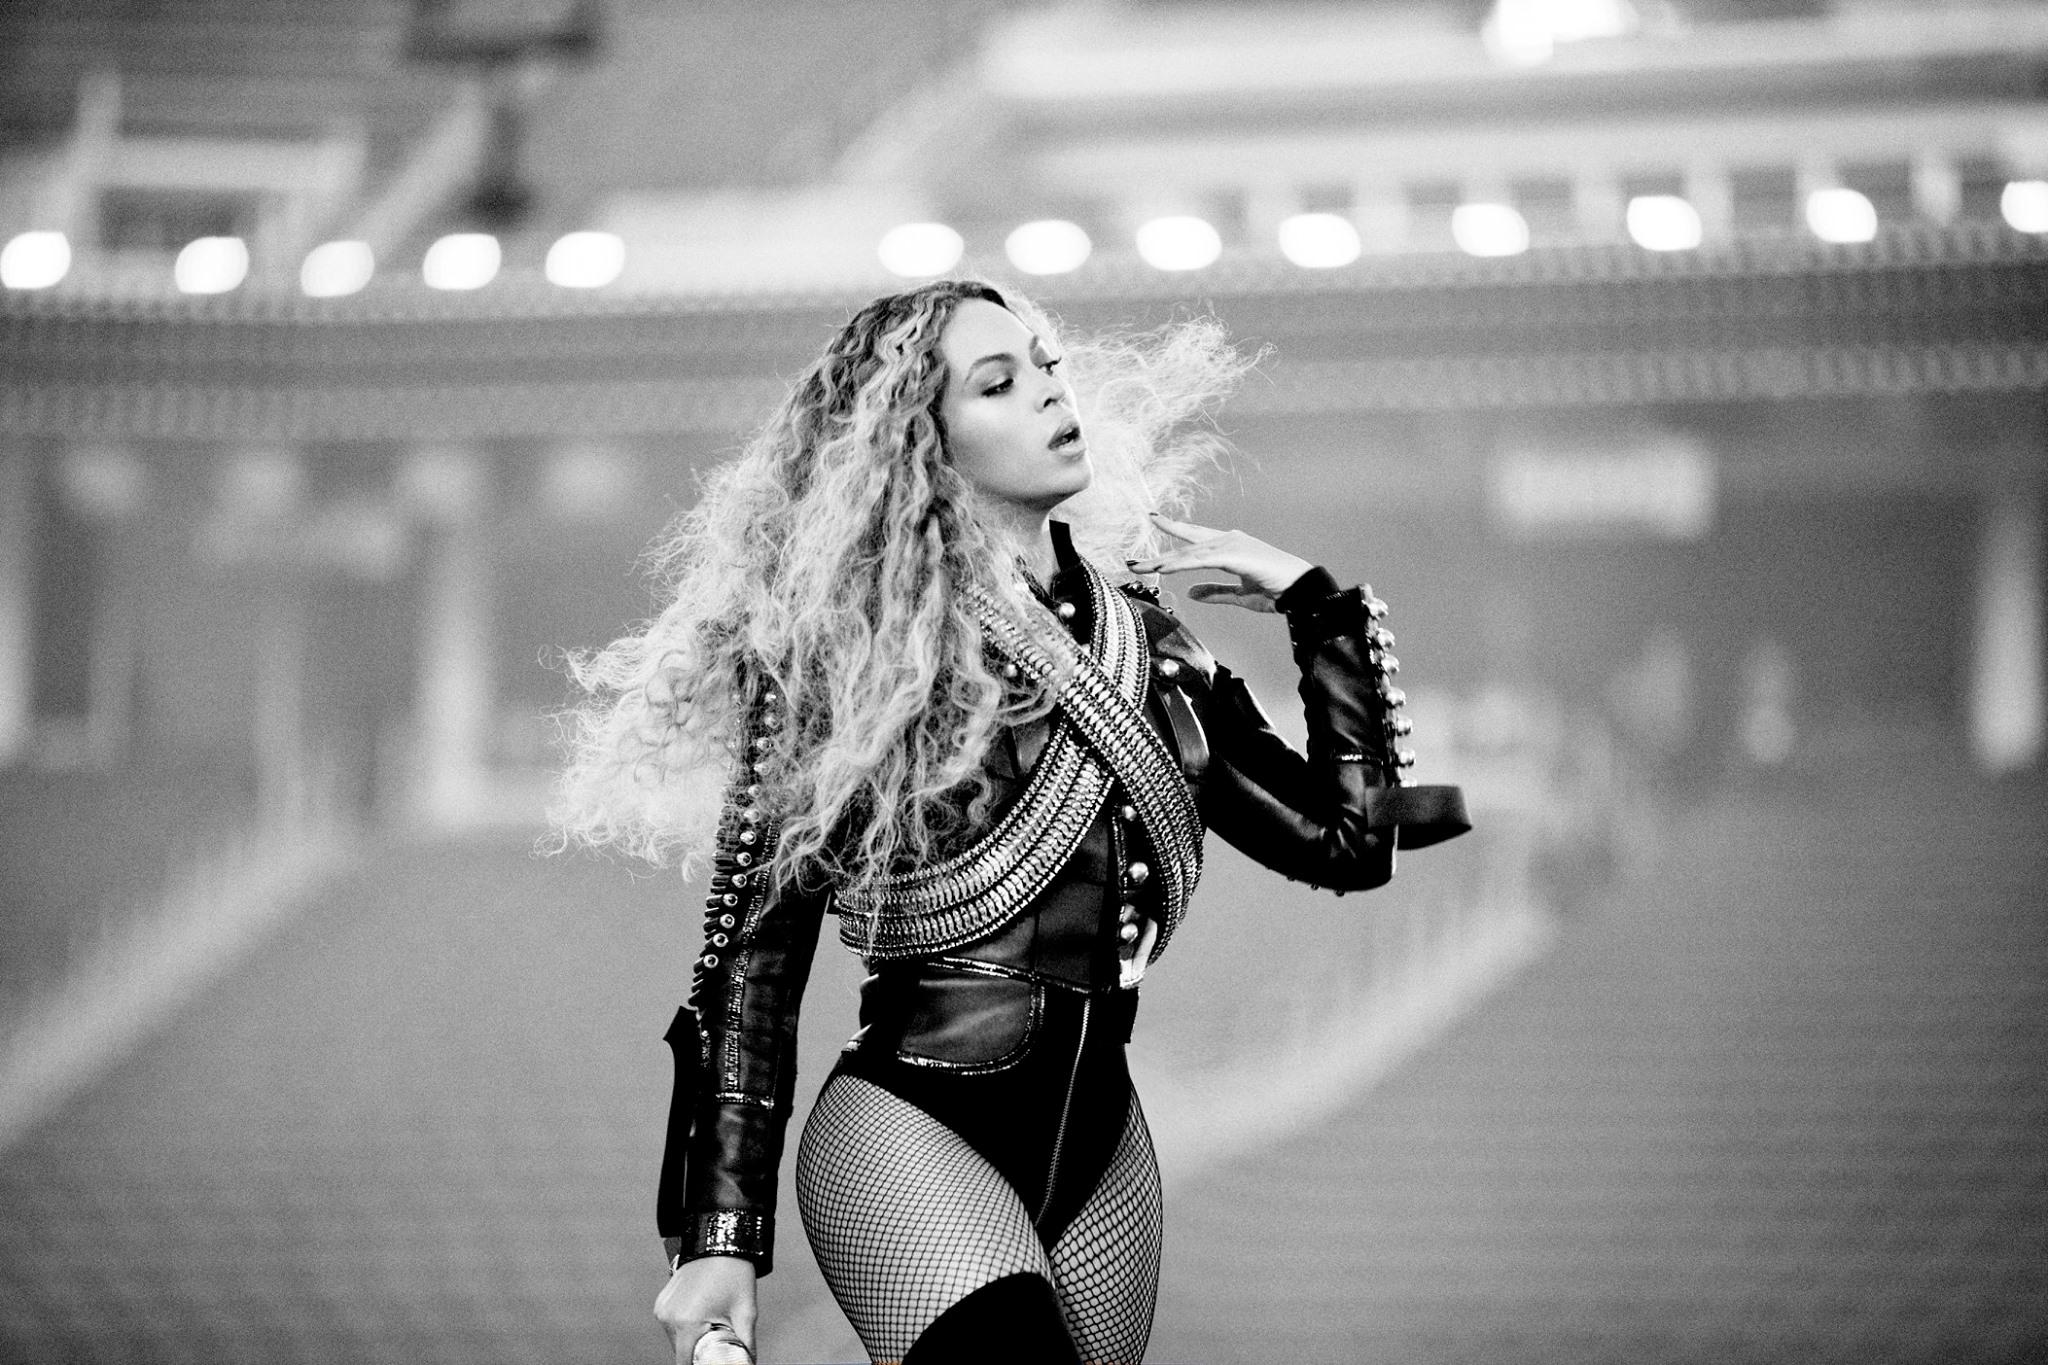 Beyonce sextapes